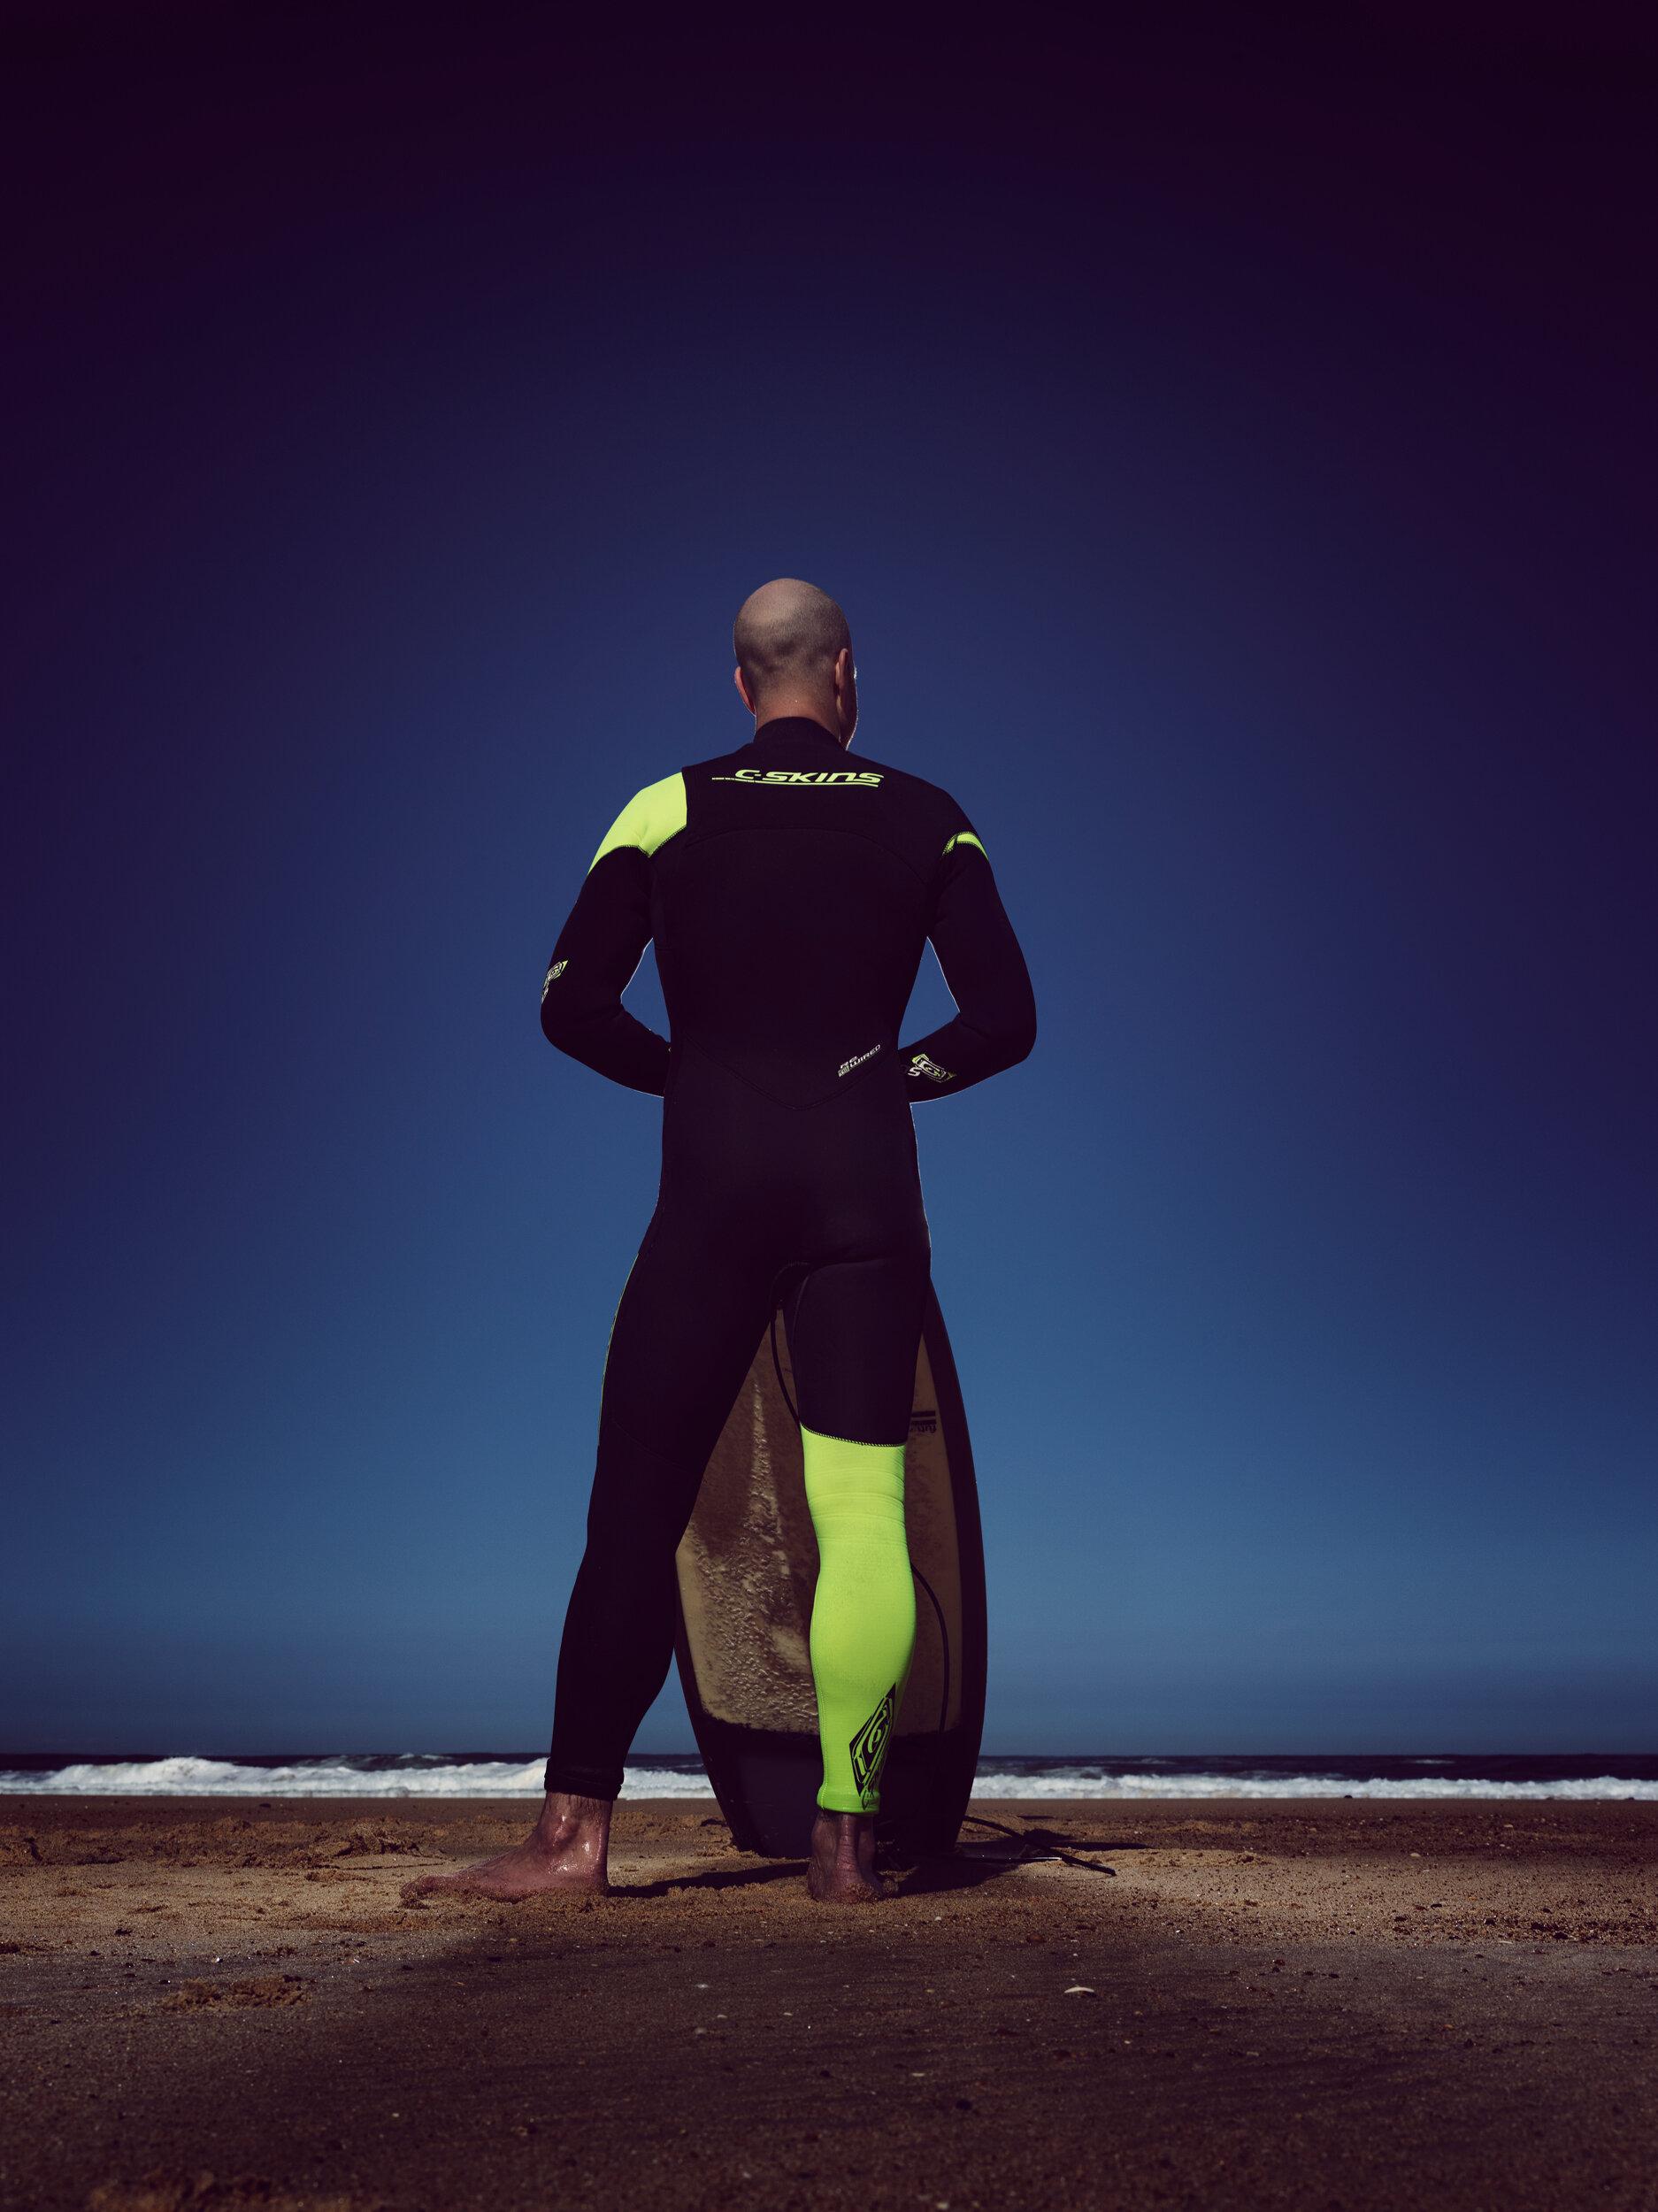 Surf_8.jpg